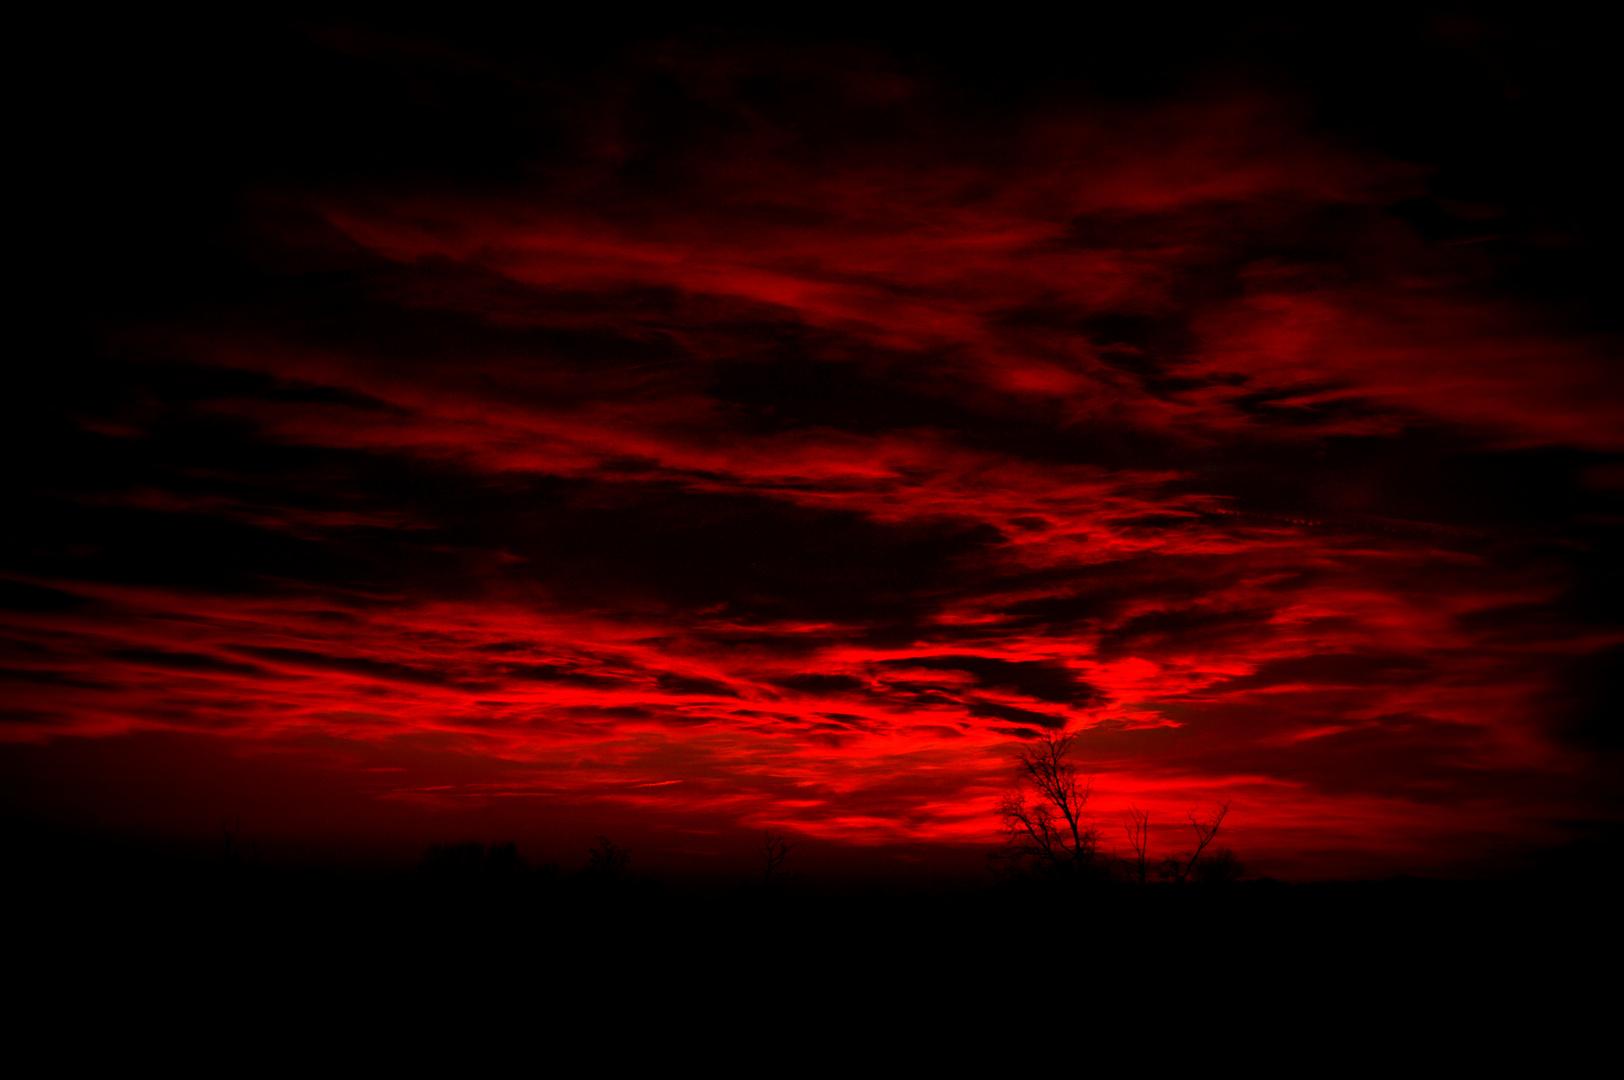 Red & Black Sunset